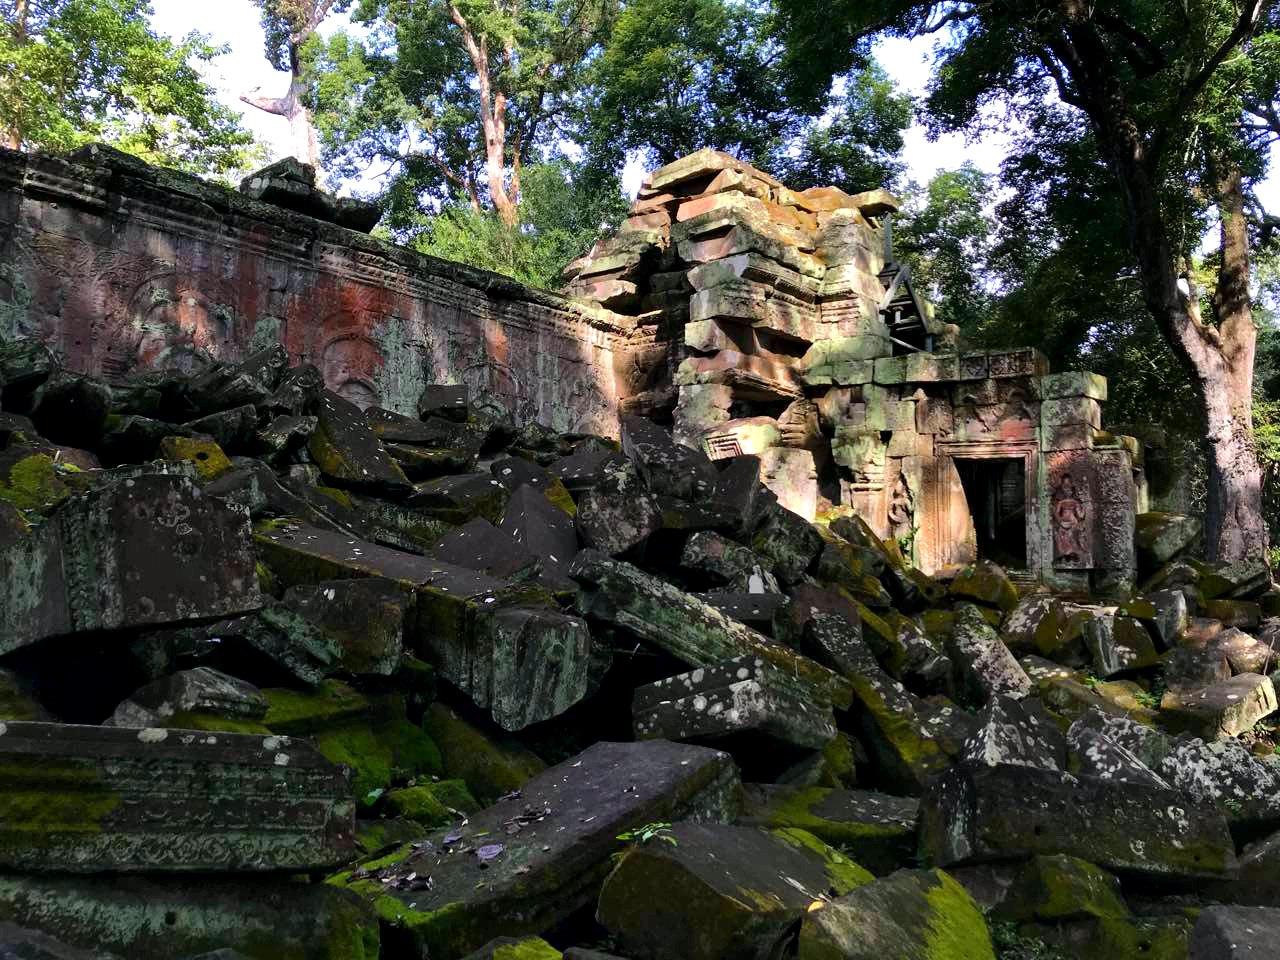 Елена Руденко (Валтея). Камбоджа. Ангкор. X_MyKJRY0hc